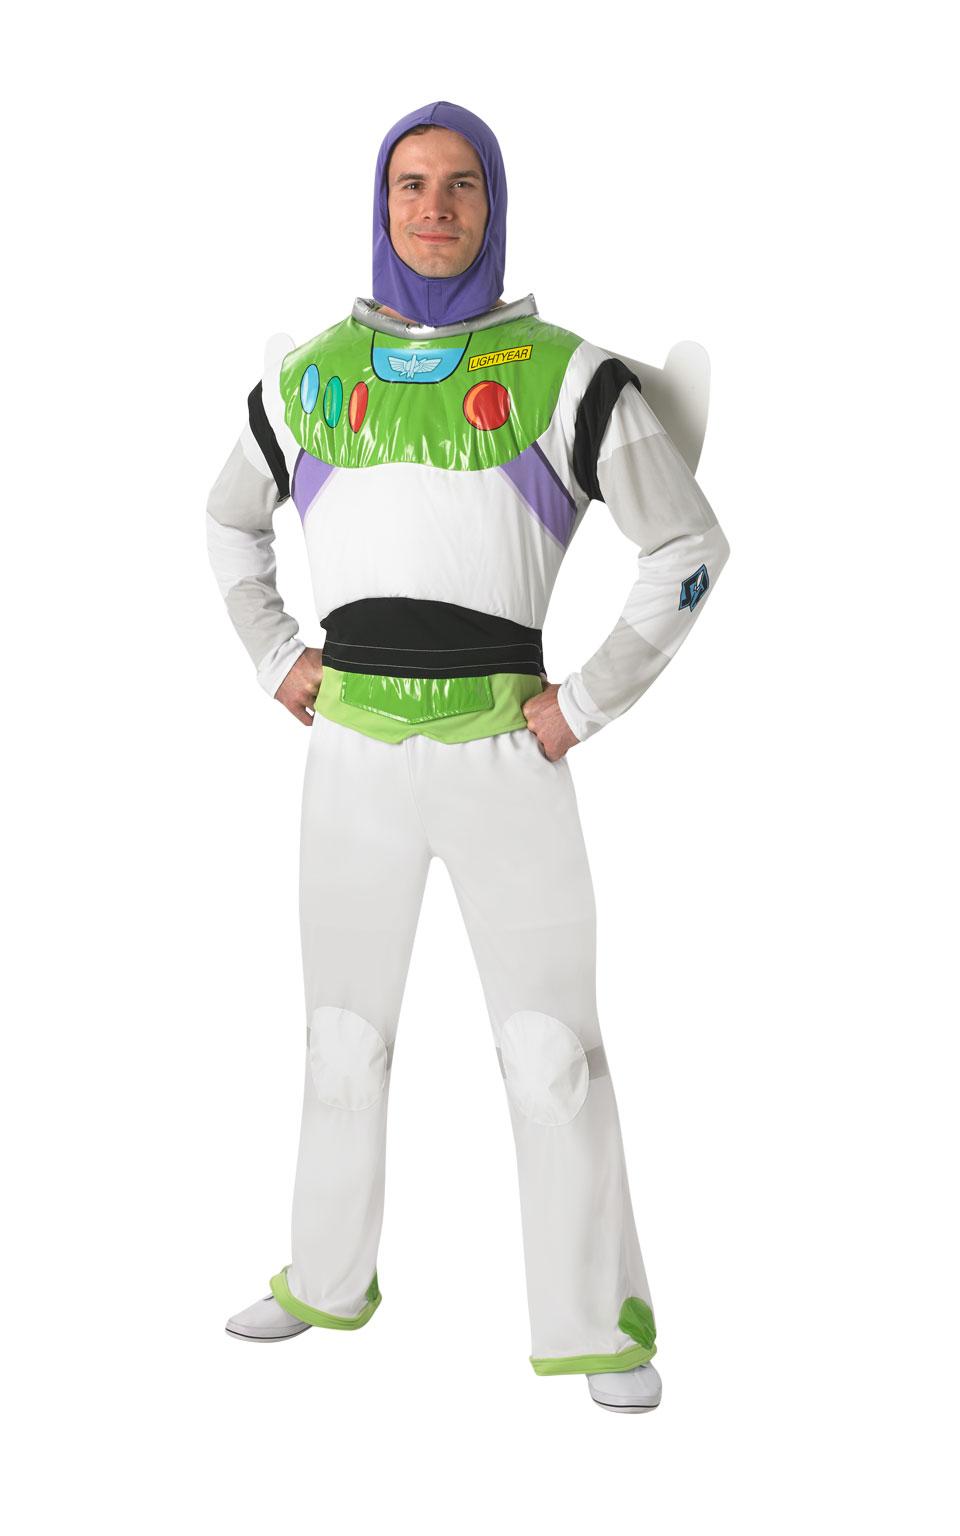 buzz lightyear space suit - photo #22